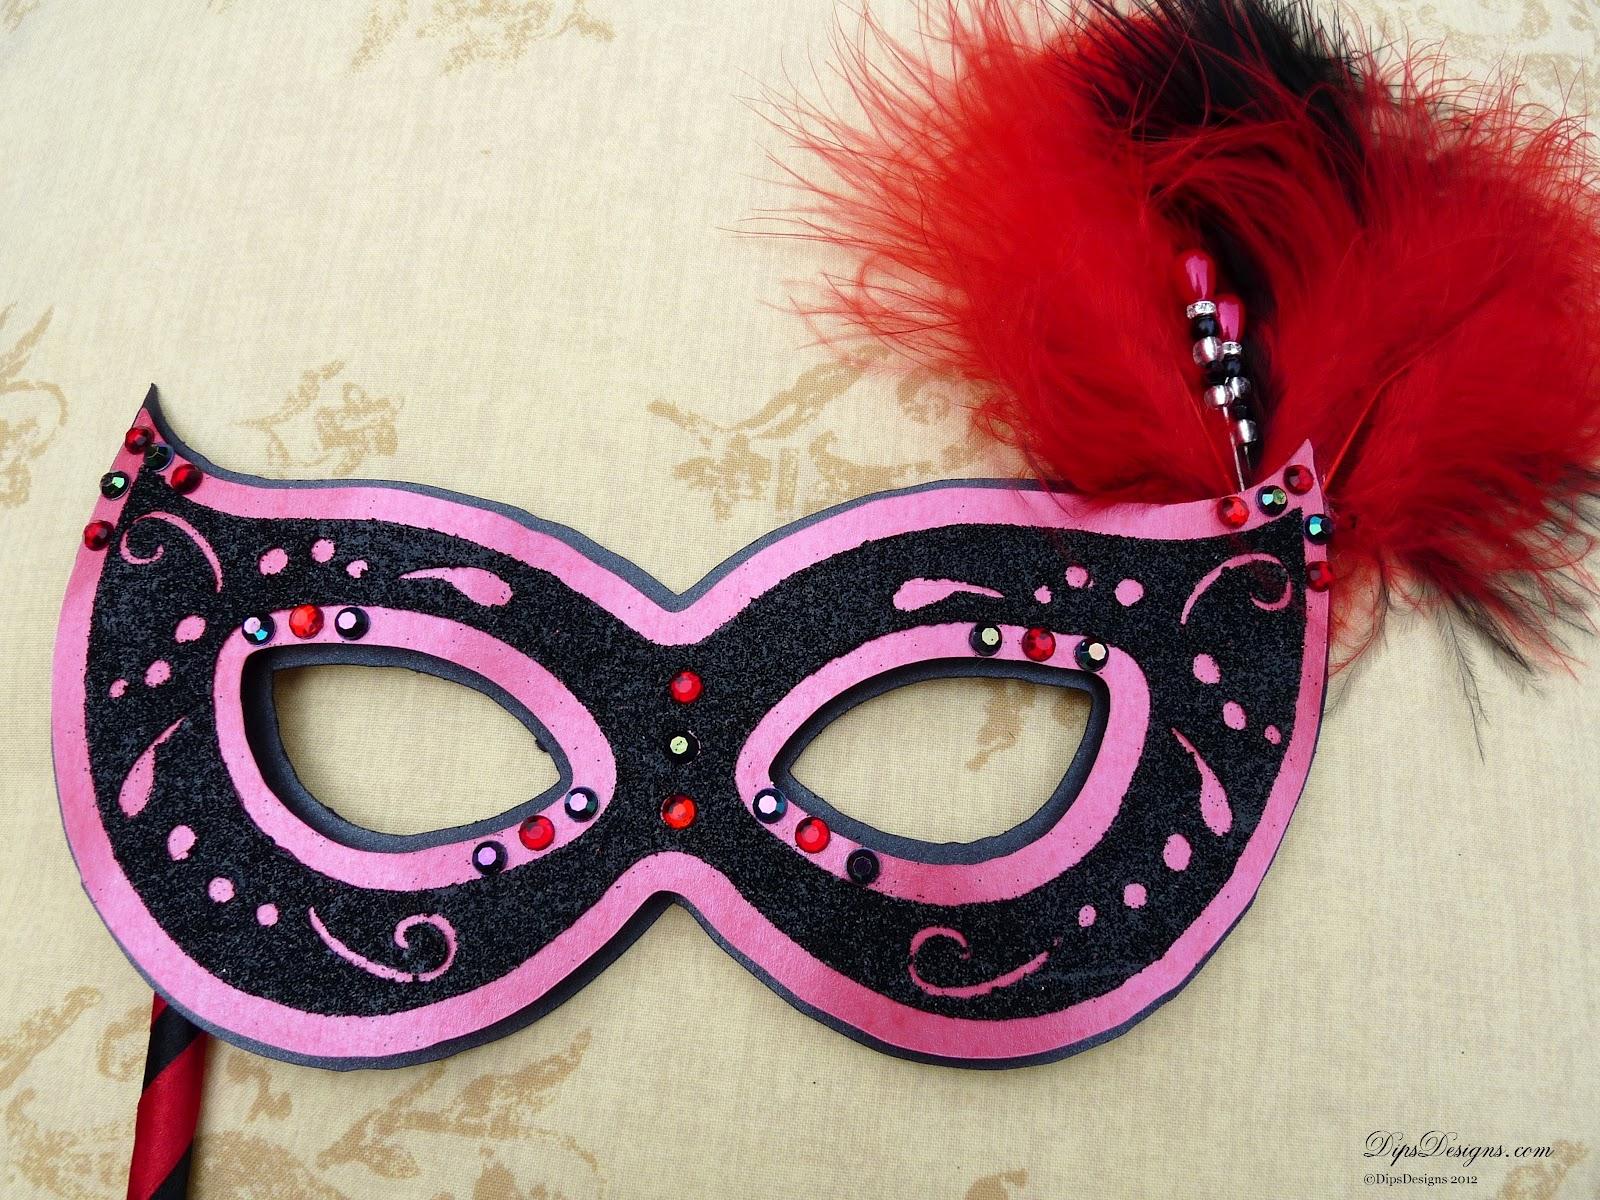 dipsdesigns silhouette cameo filigree masquerade mask tutorial